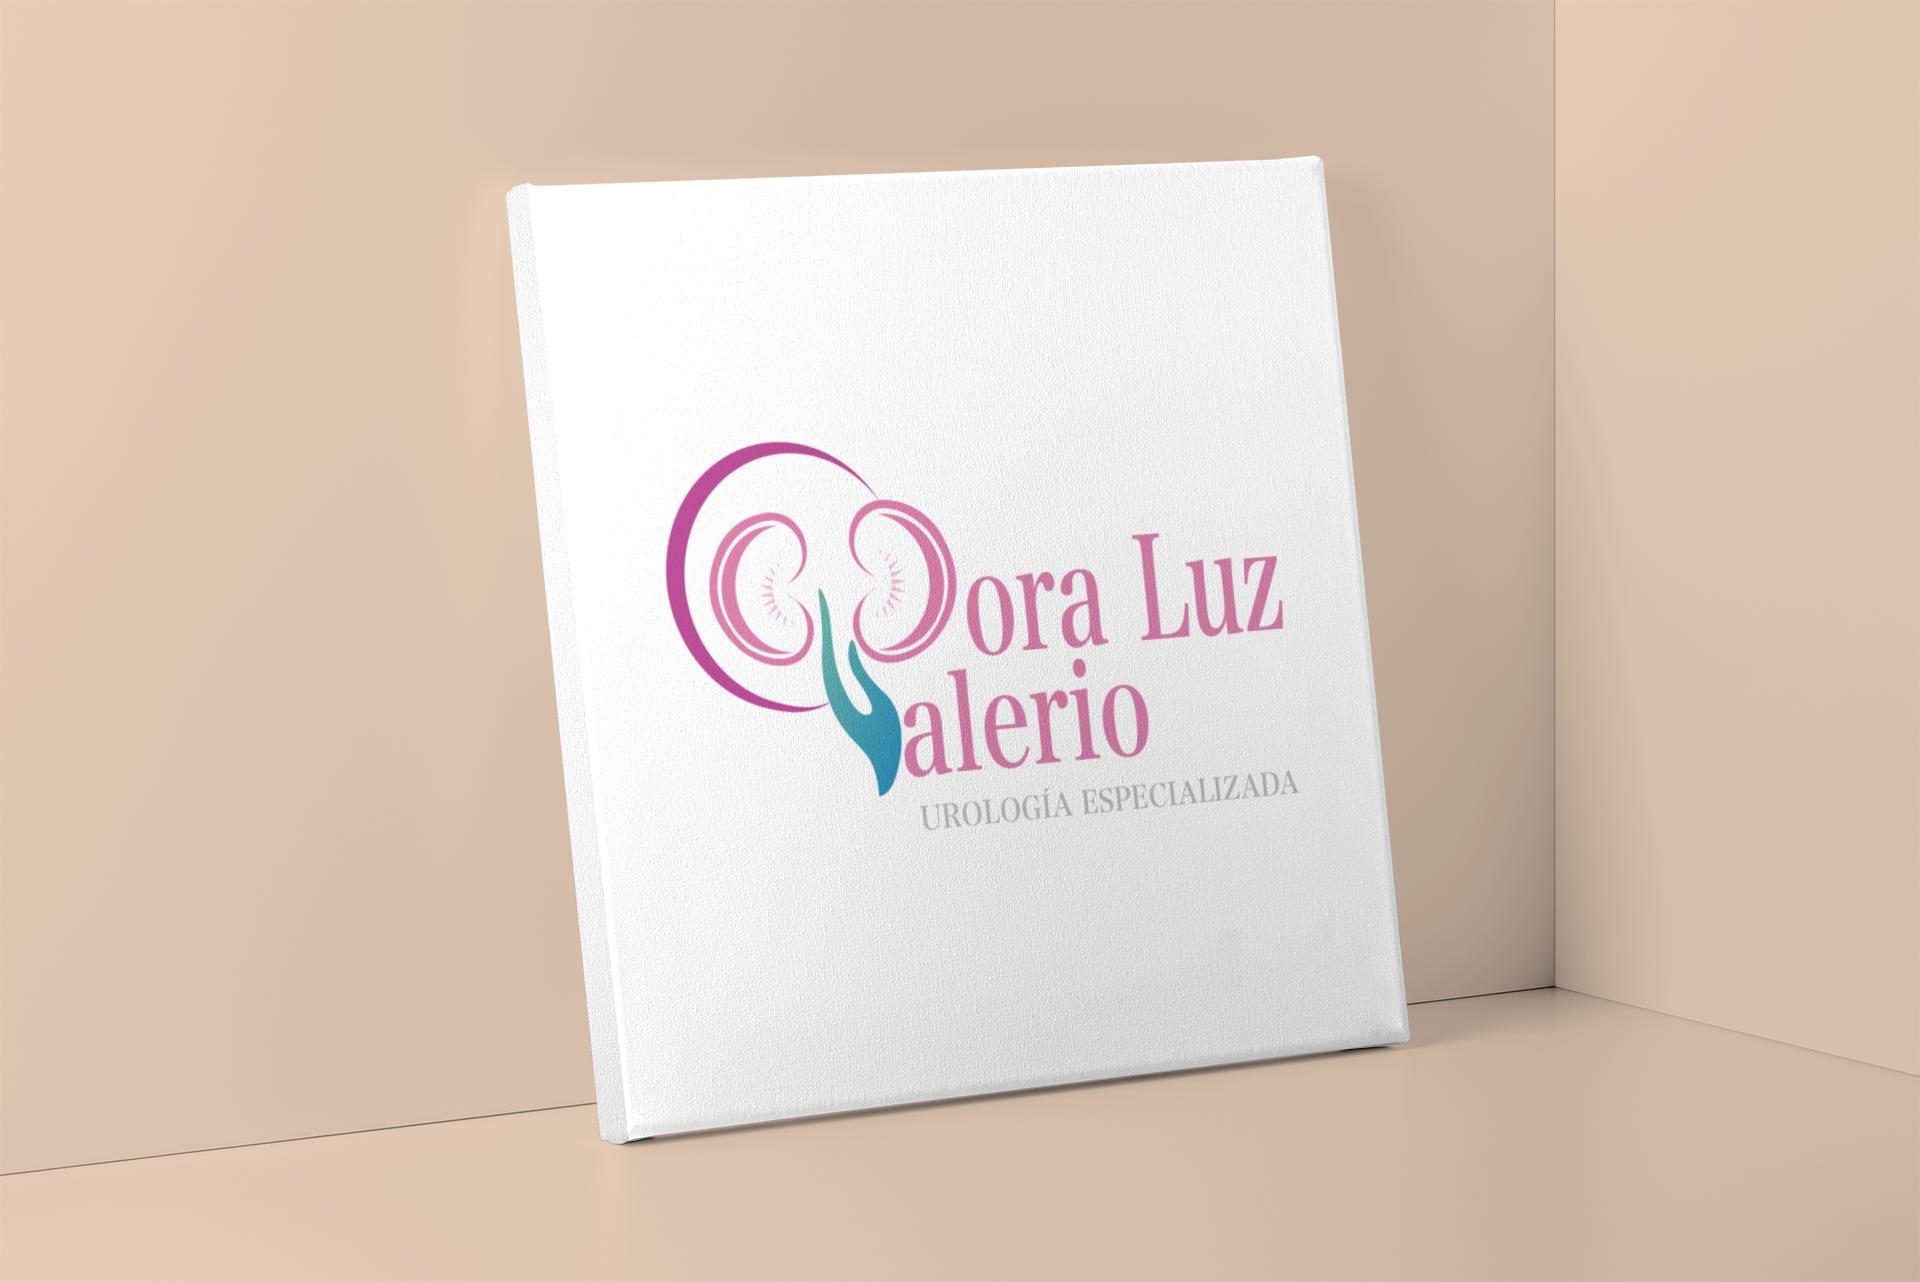 Logotipo - Dr. Dora Luz Valerio.